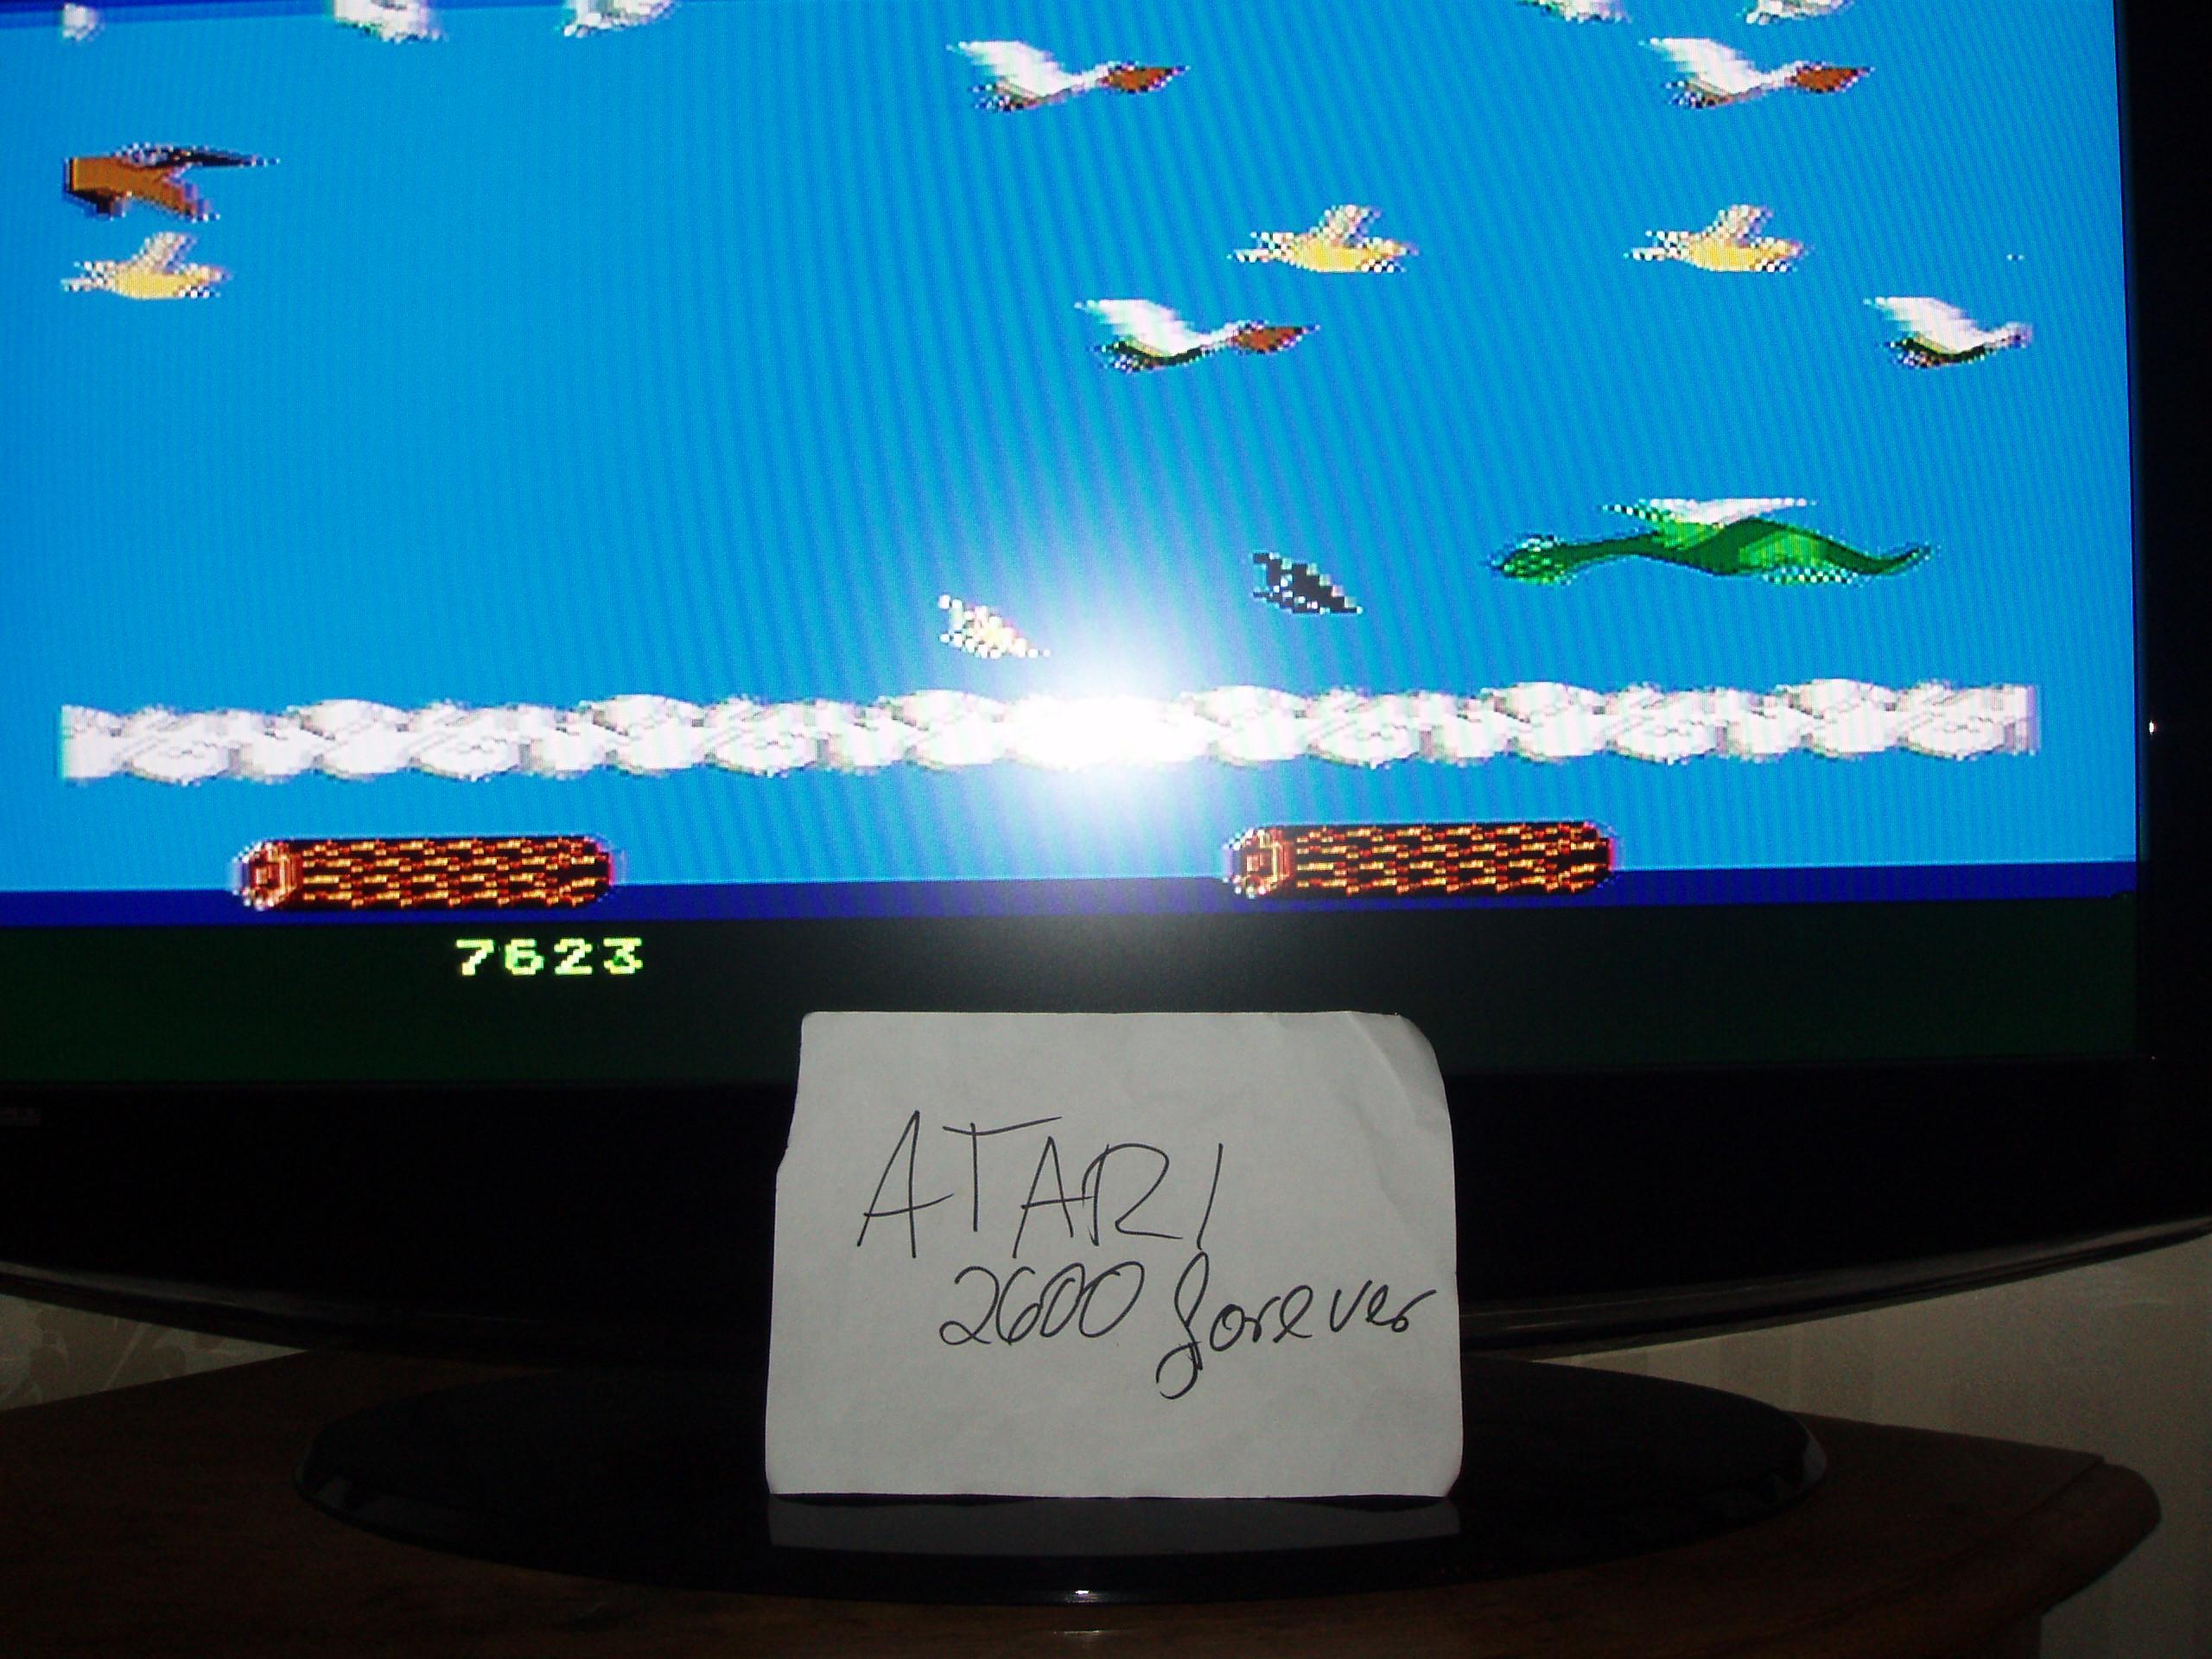 atari2600forever: Frogger II: Threedeep (Atari 5200) 7,623 points on 2018-11-09 03:13:07